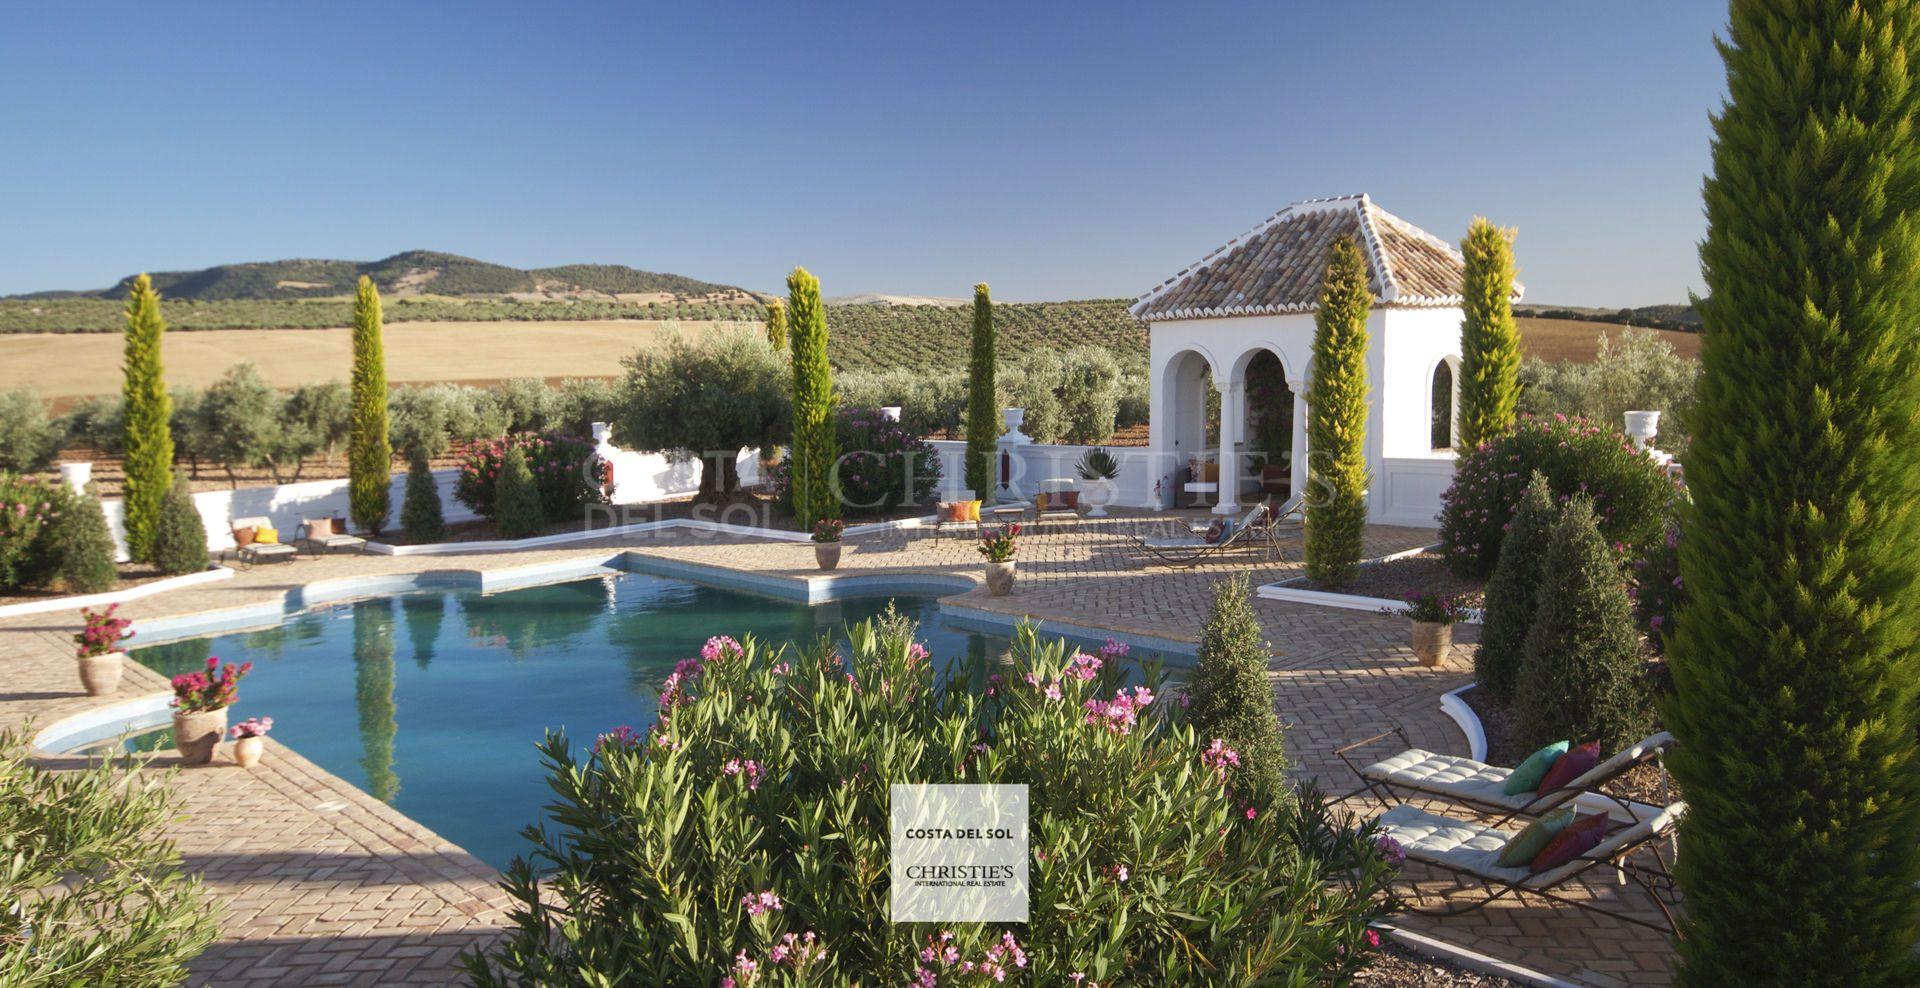 Hacienda The Palacio | Christie's International Real Estate